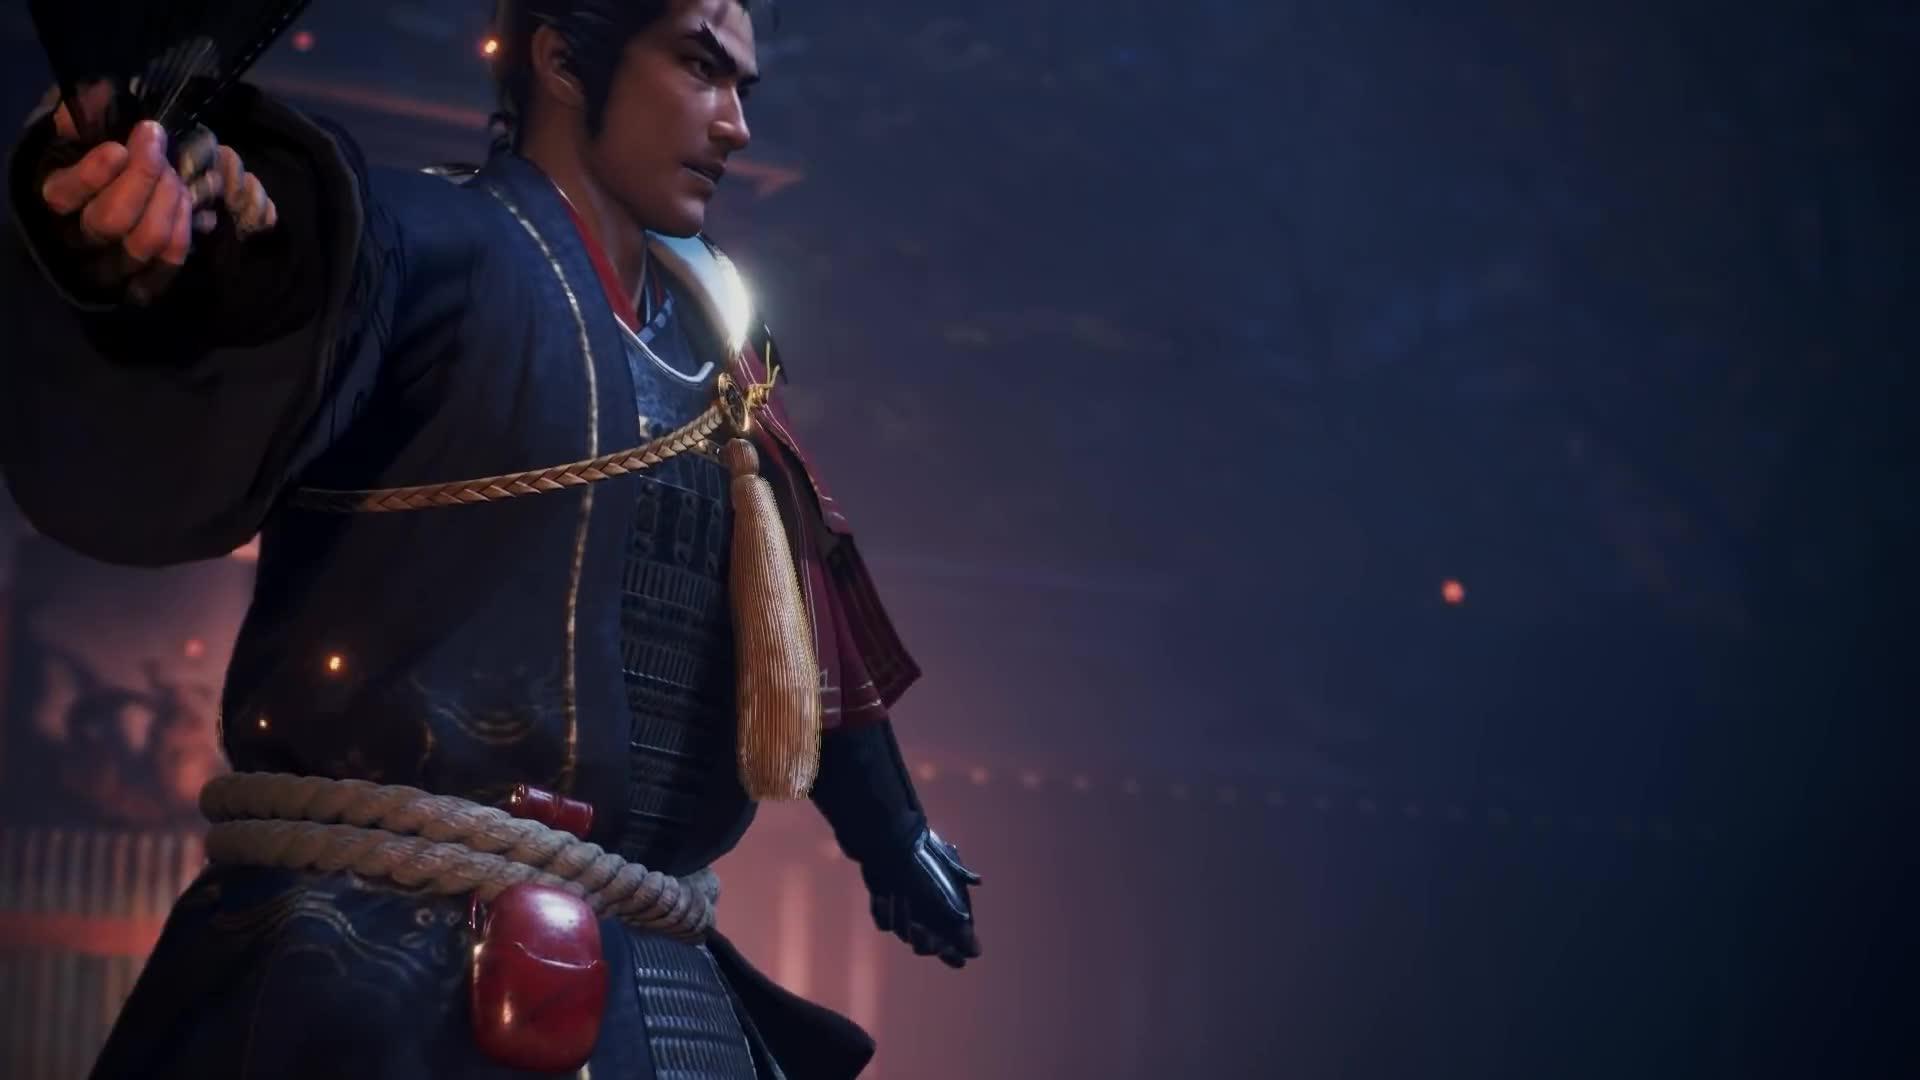 Nioh 2 - Story Trailer | PS4 screen capture